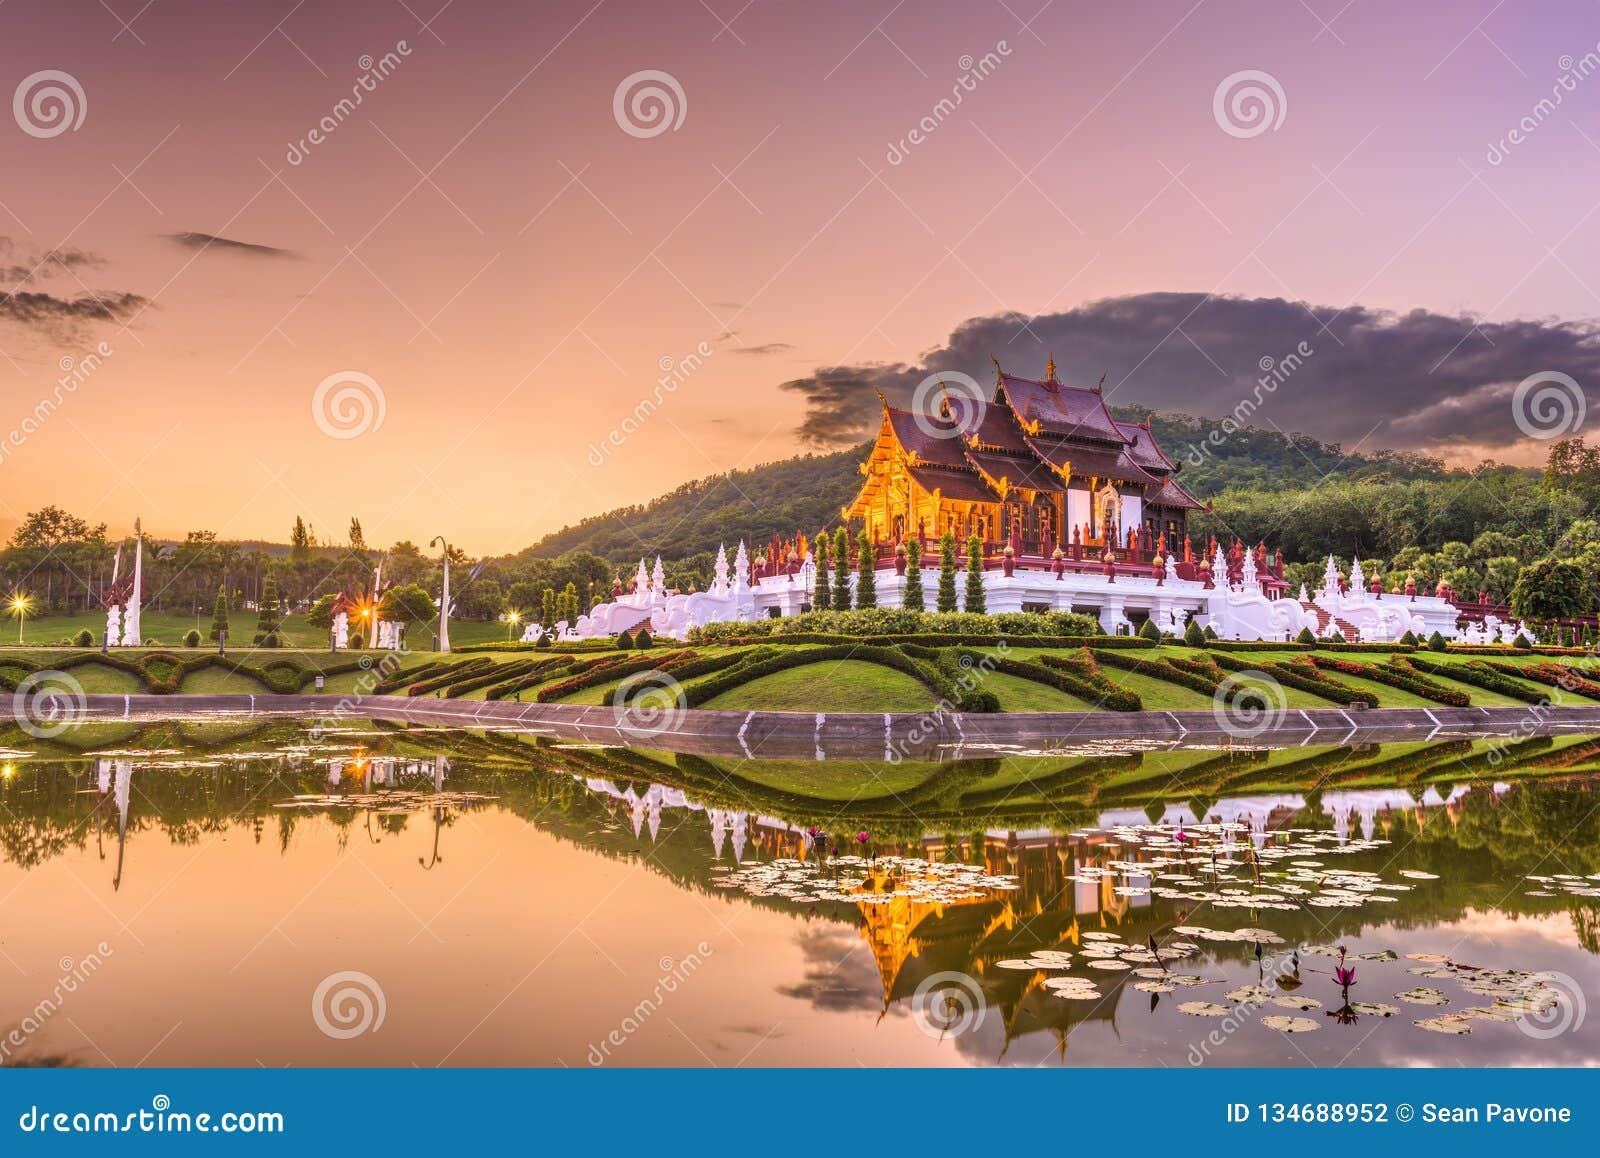 Chiang Mai, parque de Tailandia y pabellón